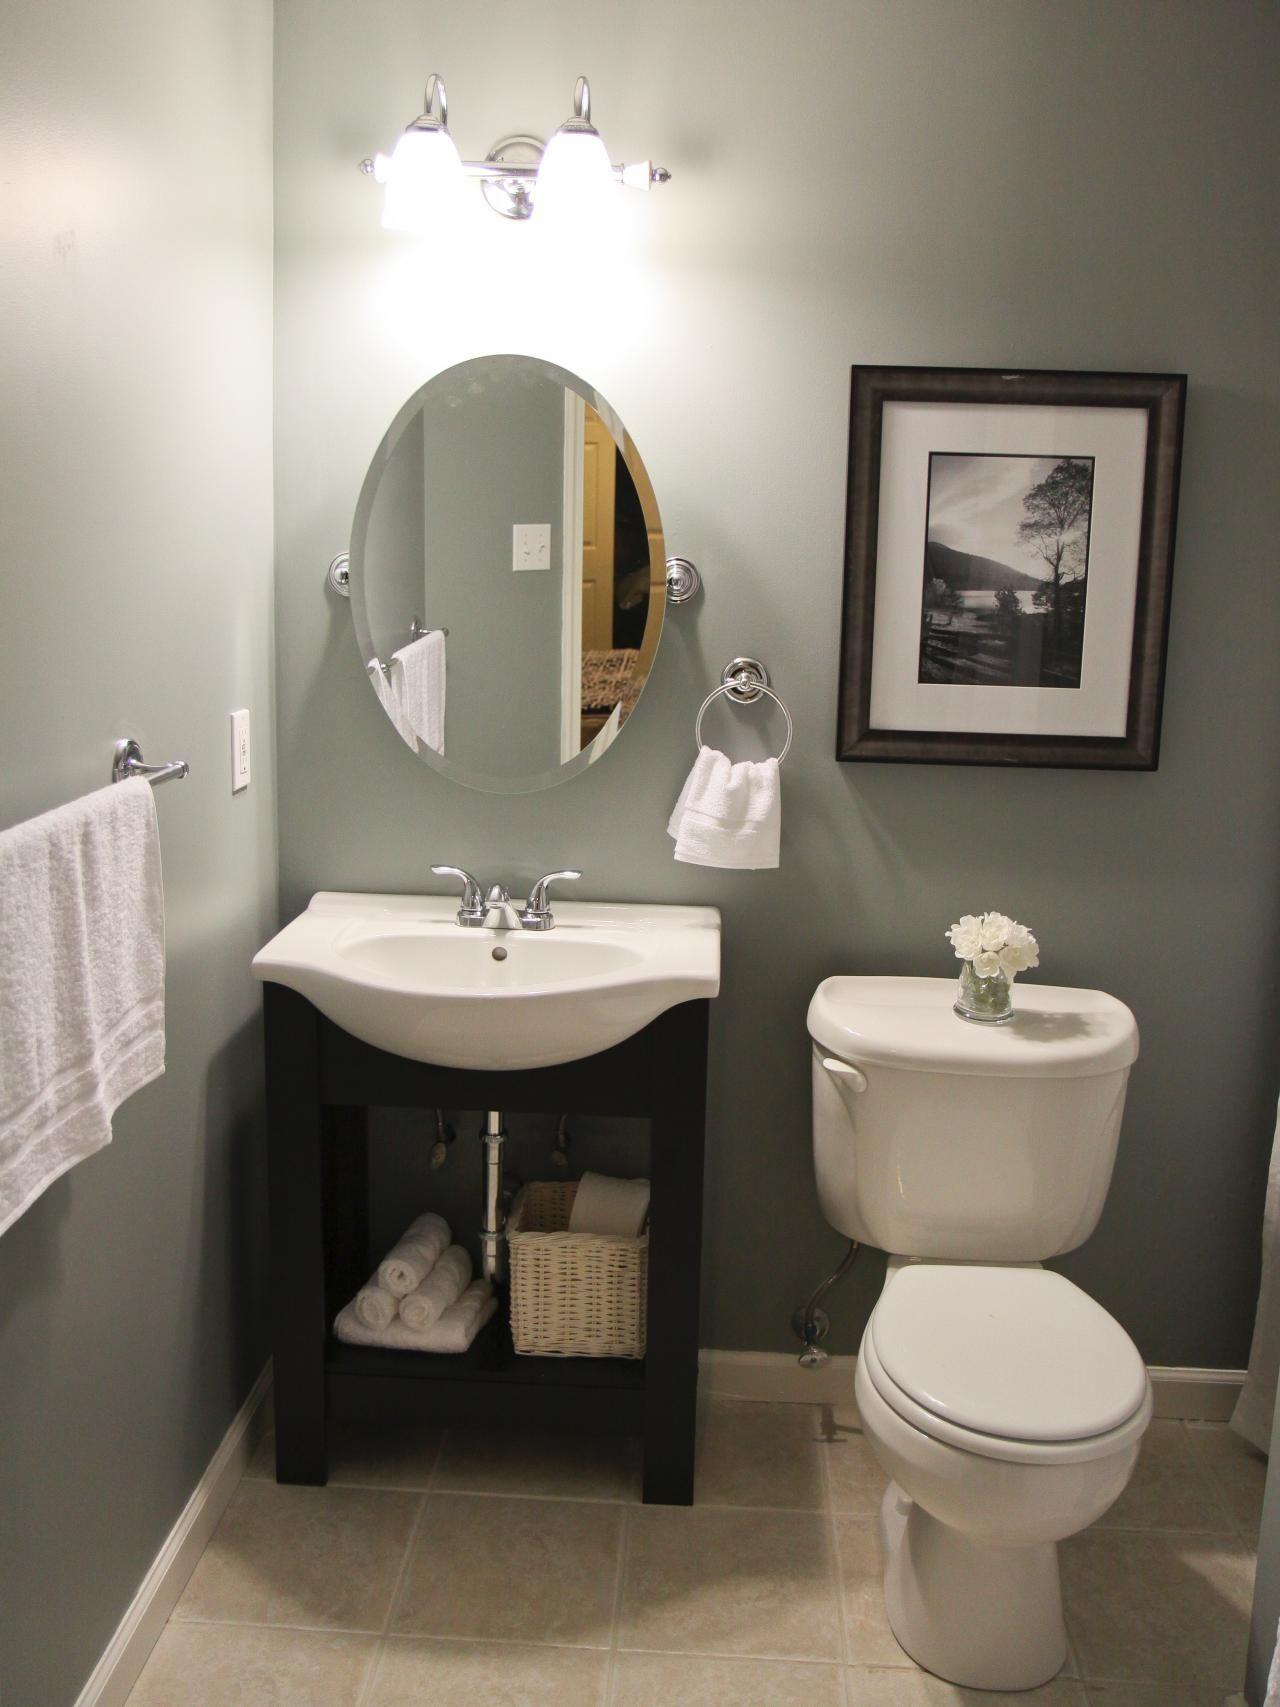 Small Half Bathroom Ideas Photo Galleryhalf Bathroom Designs Fair Bathroom Renovation Ideas For Tight Budget Design Ideas